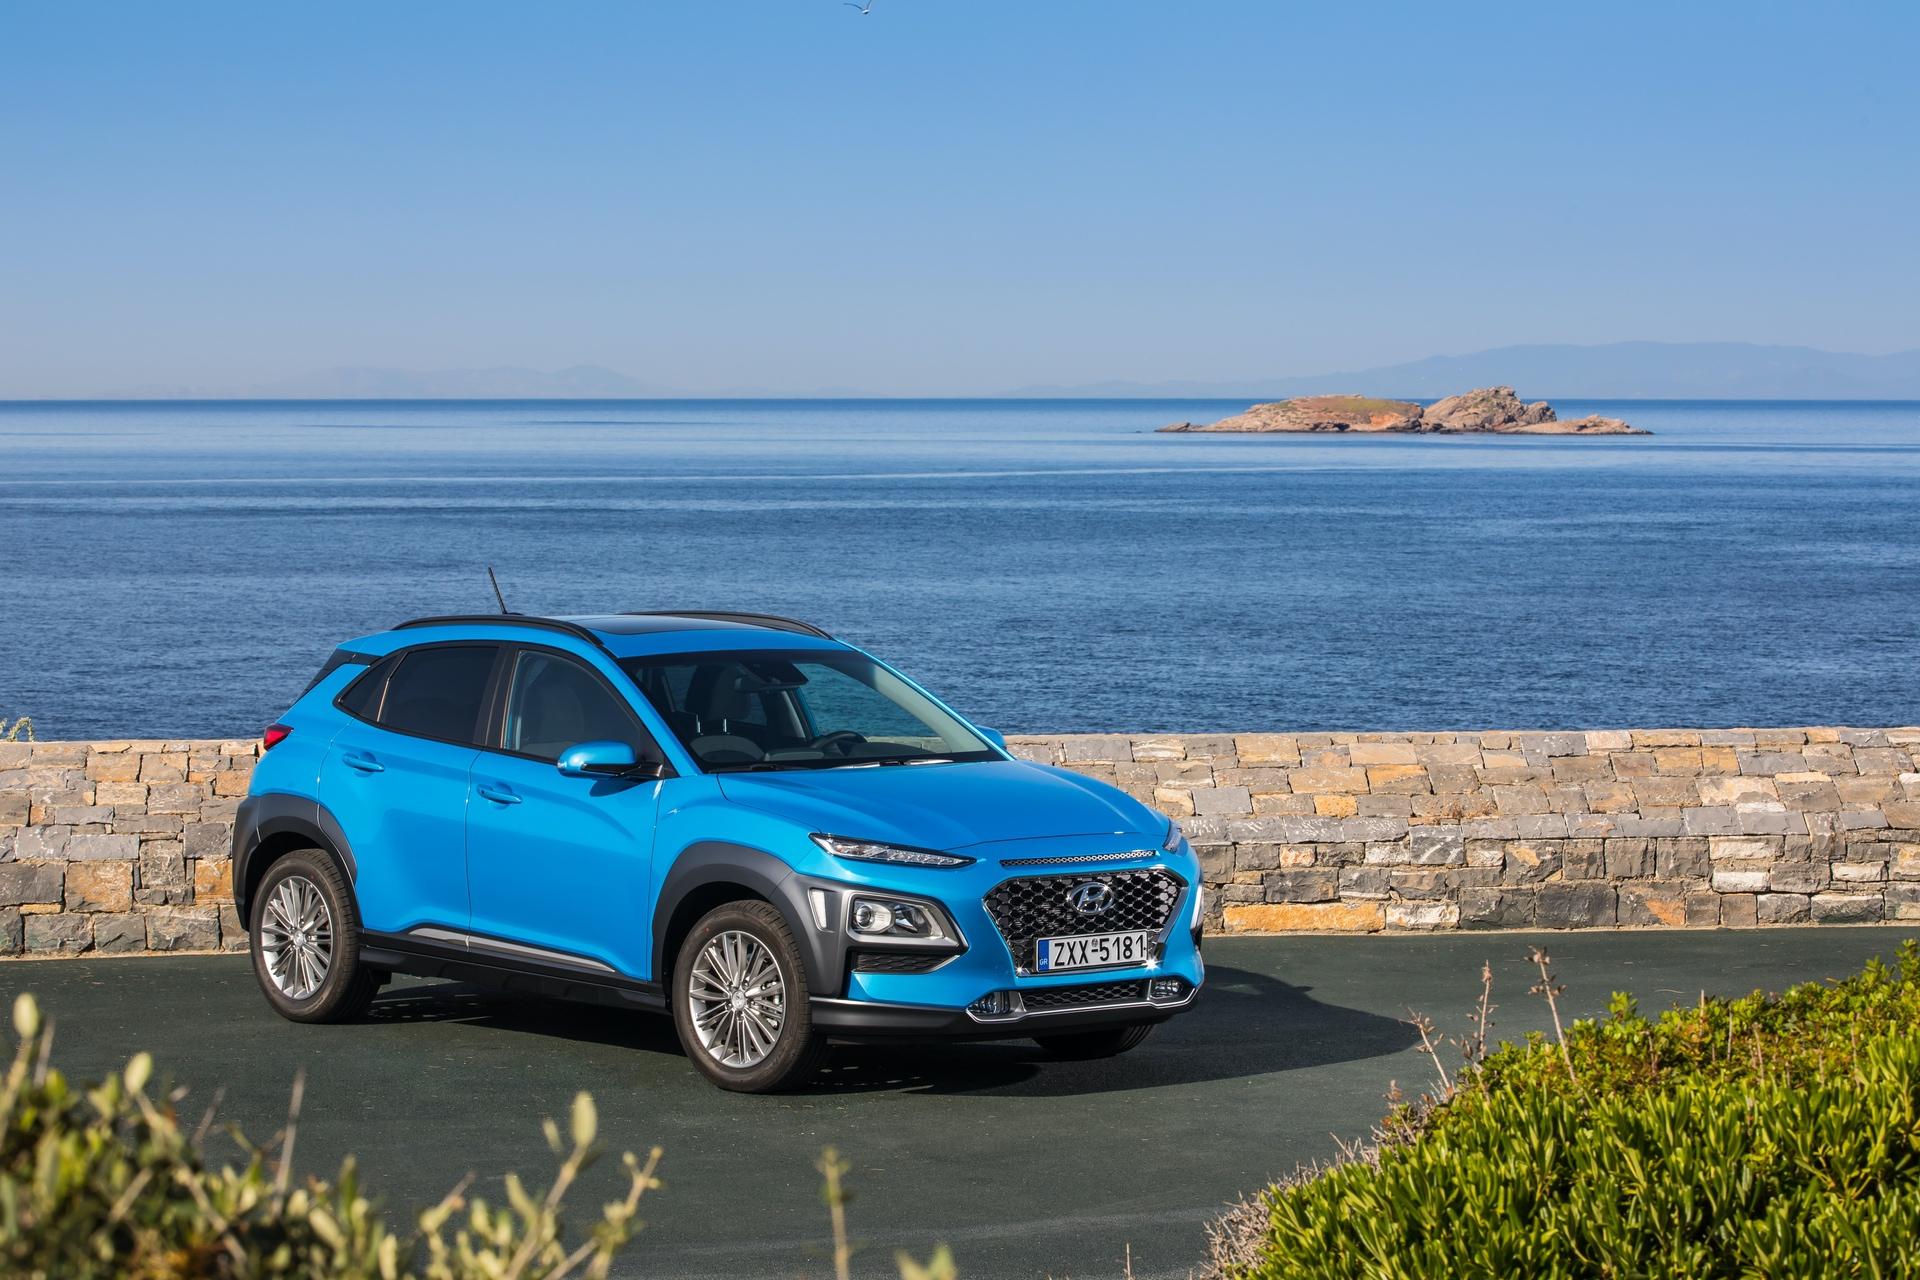 Hyundai_Kona_greek_presskit_0020